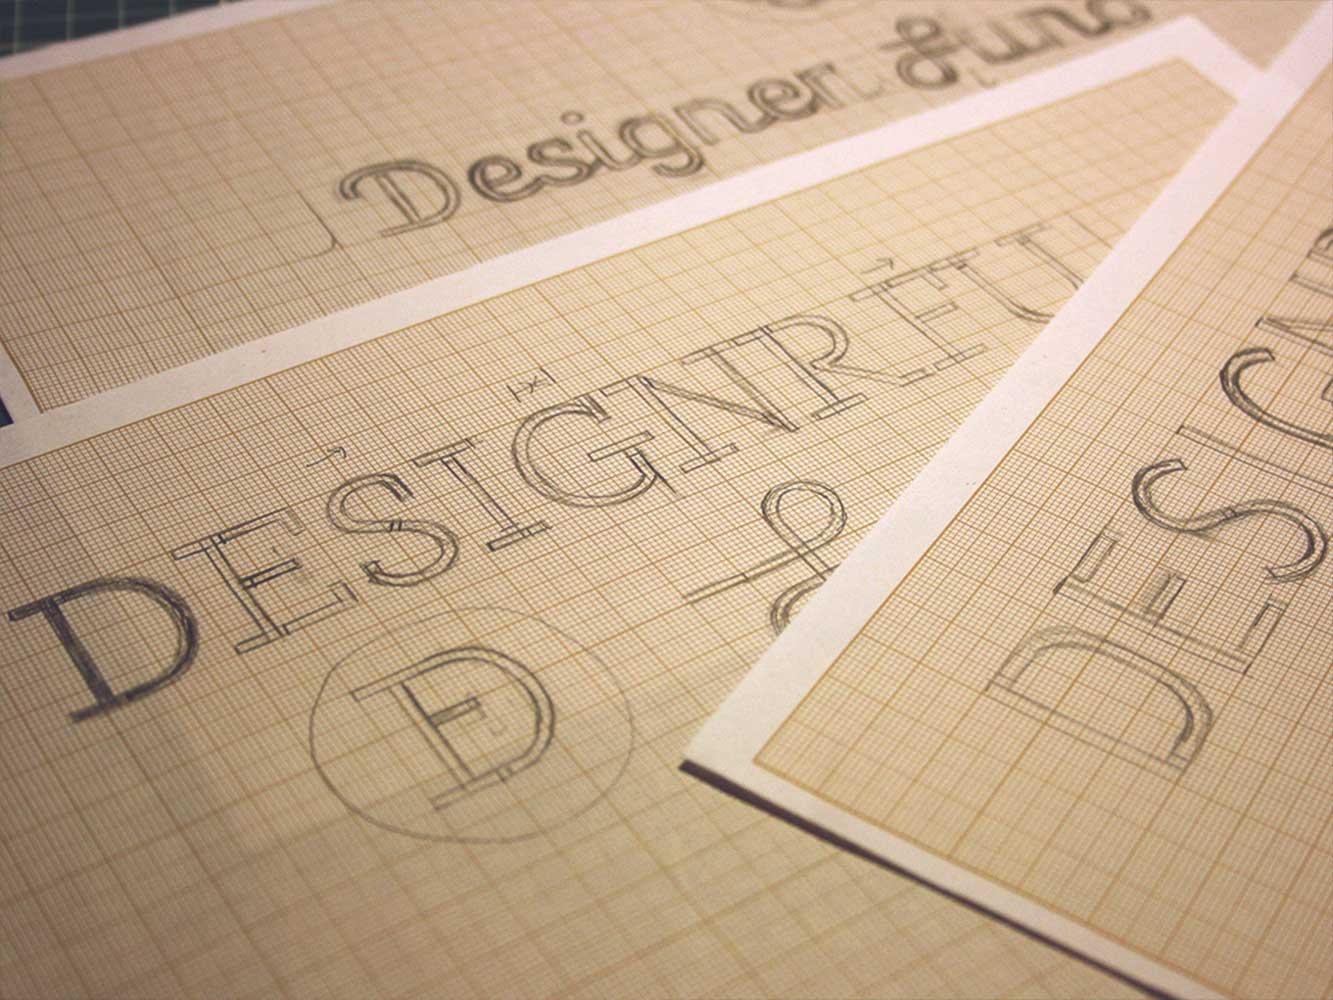 خدمات > طراحی گرافیک > طراحی لوگو و آرم | طراحی غرفه نمایشگاهیطراحی لوگو و آرم